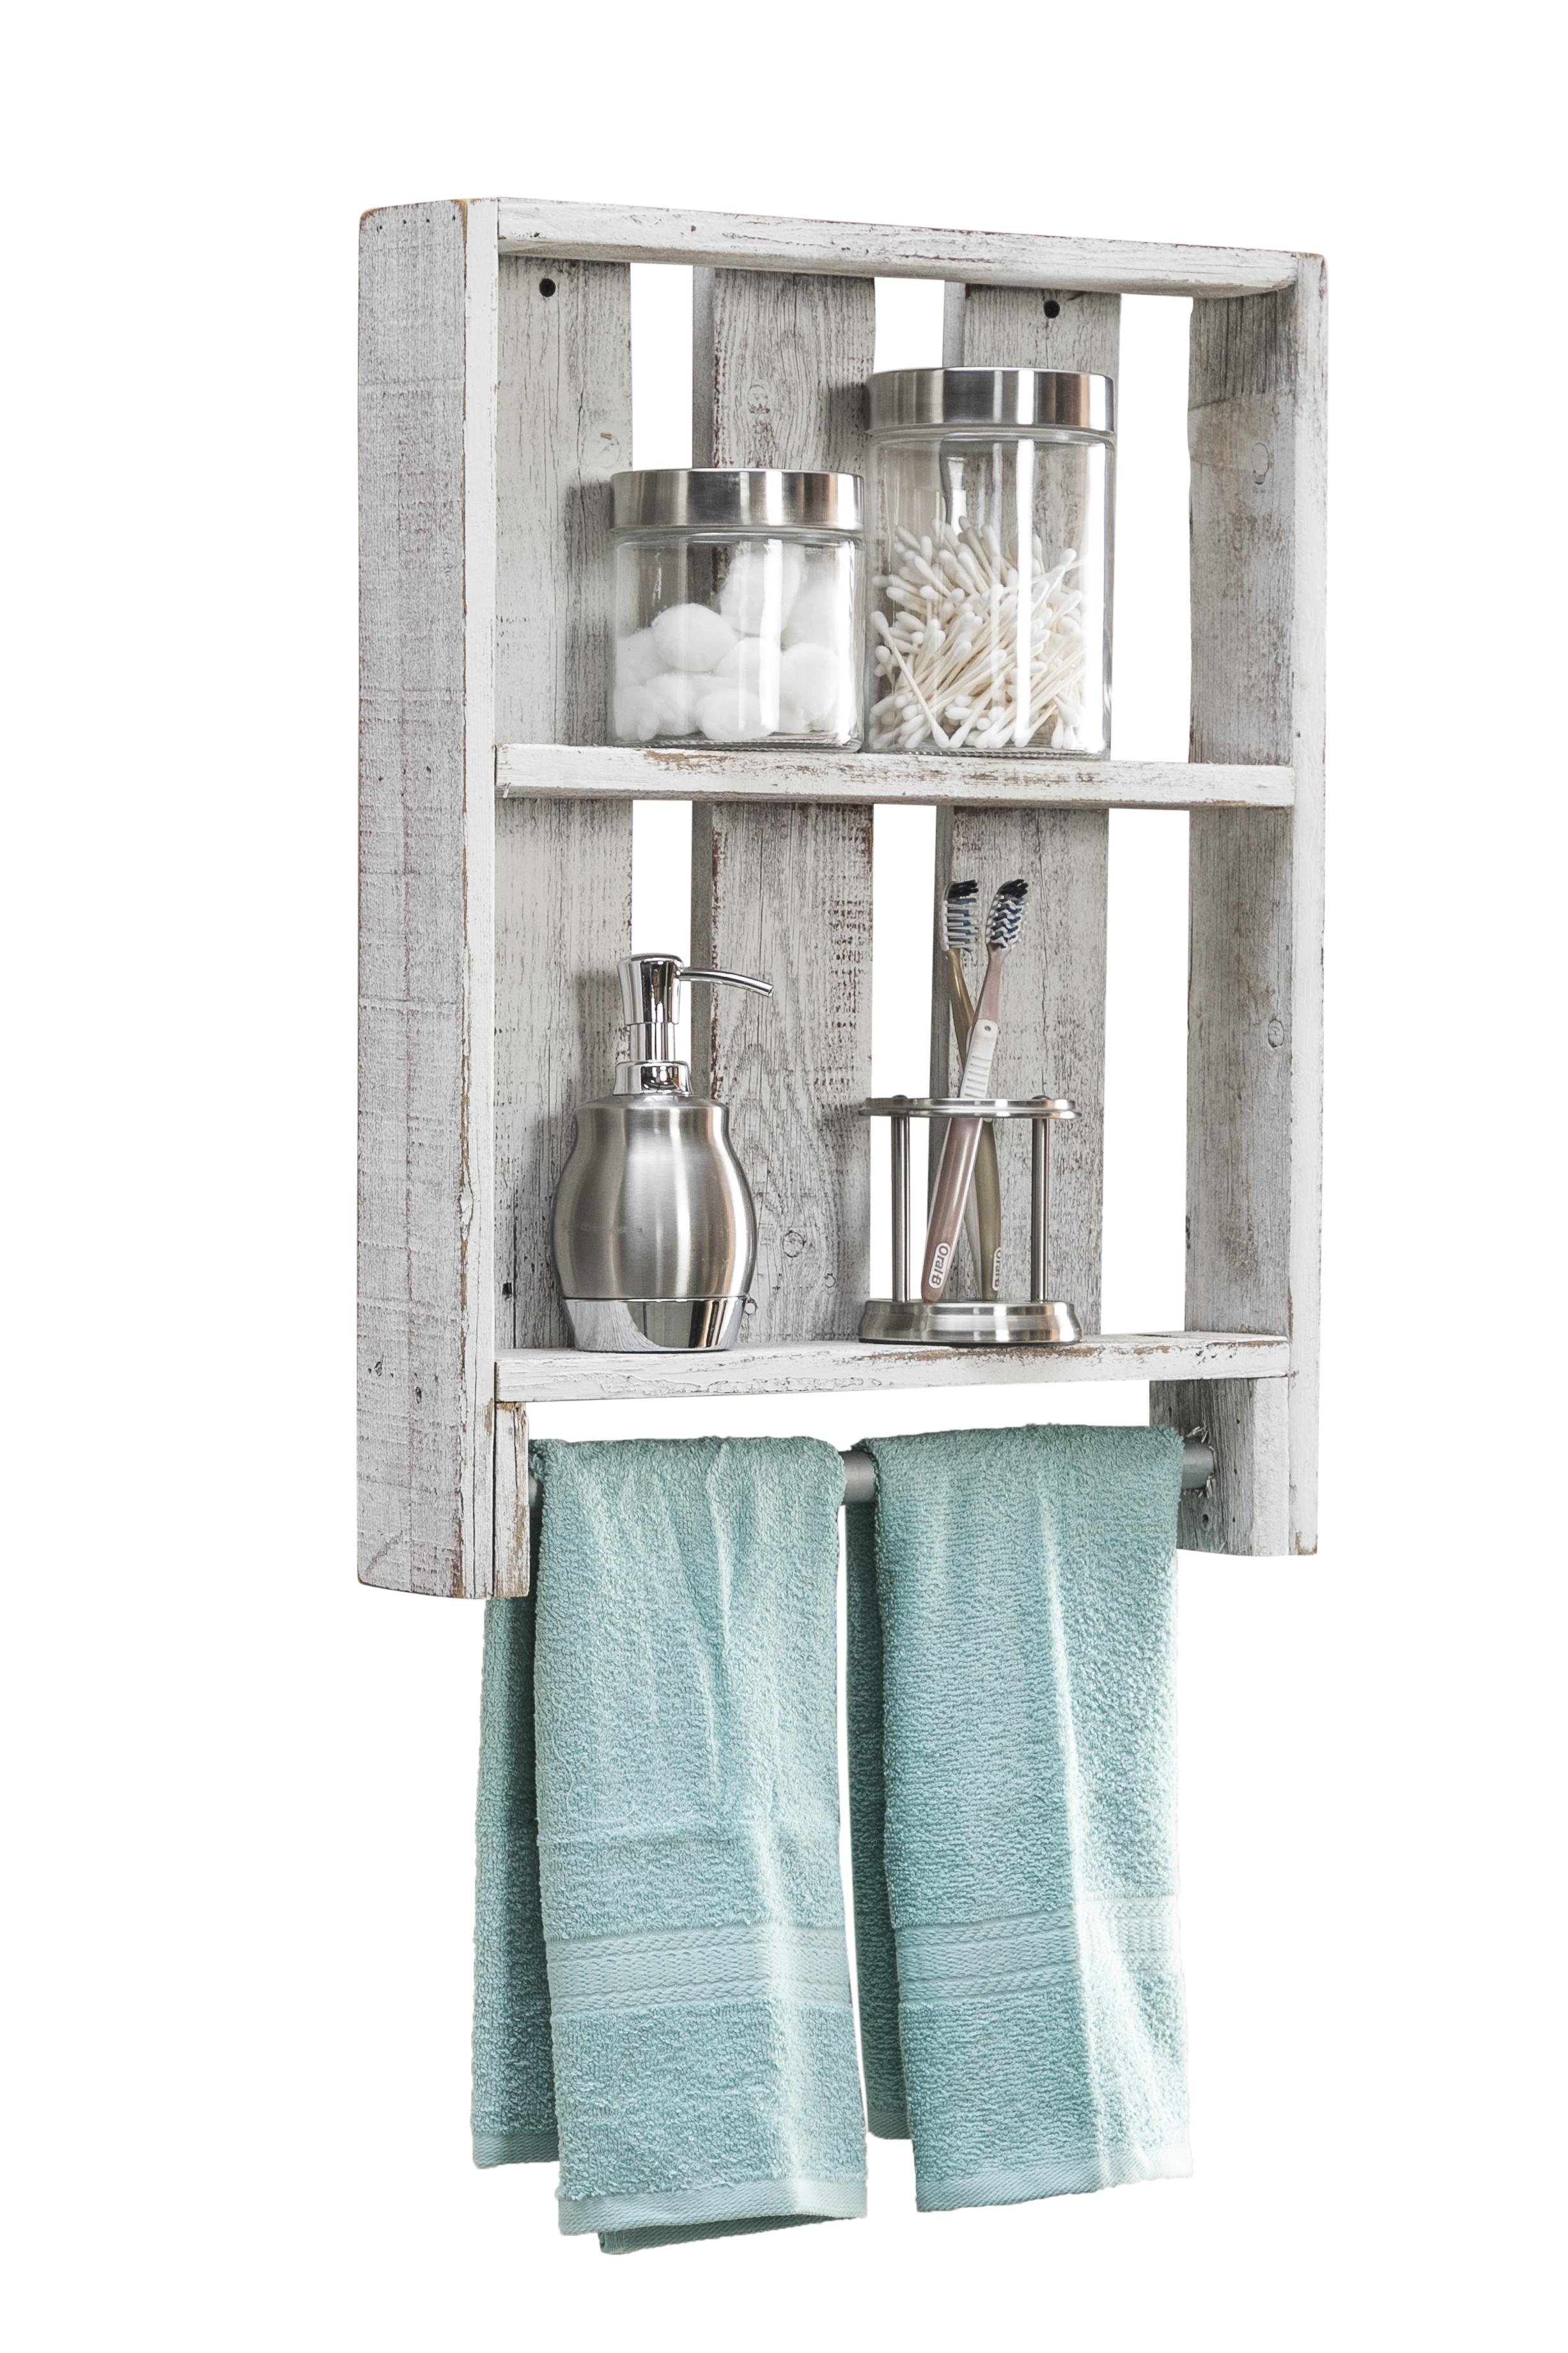 Reclaimed Wood Bathroom Plank Shelf with Towel Bar, Natural ...